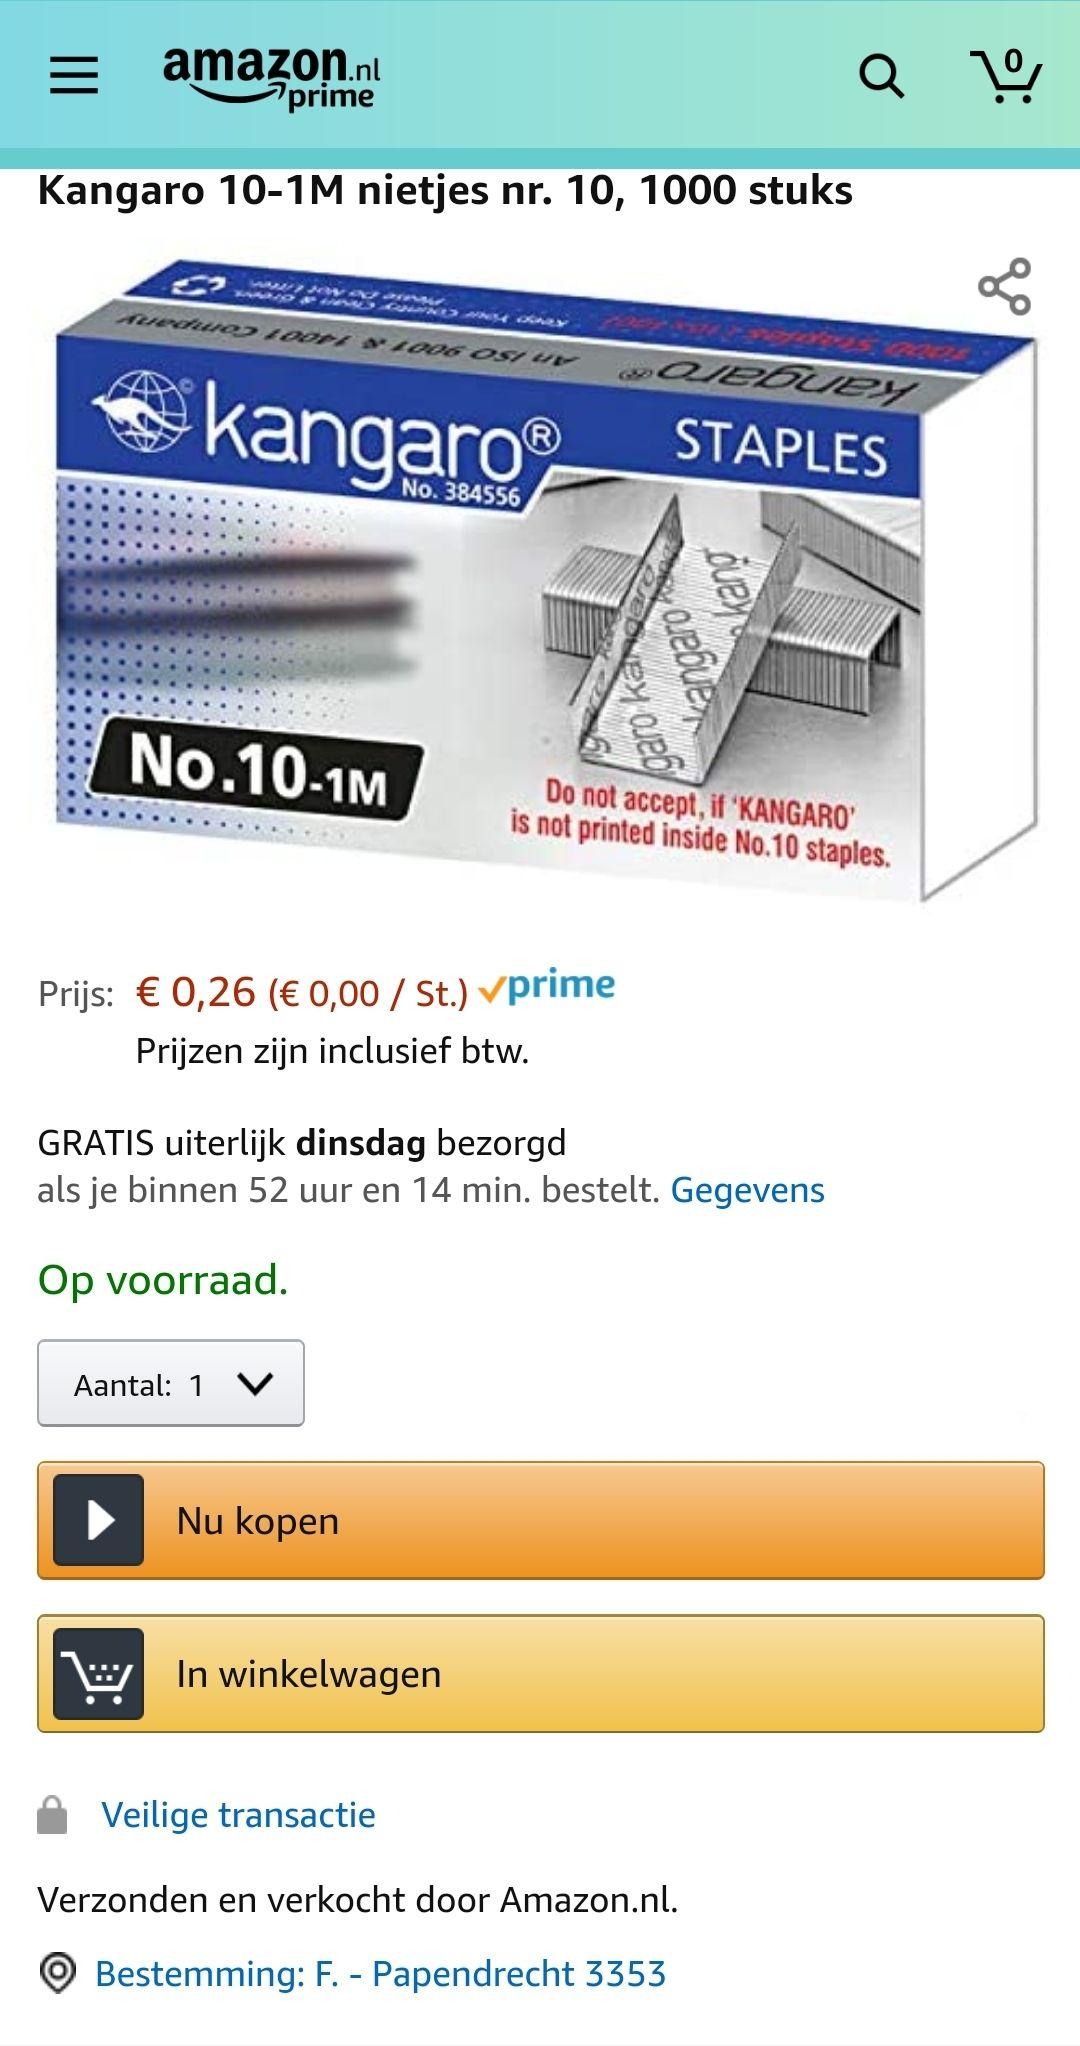 1000 nietjes €0,26 @ Amazon.nl